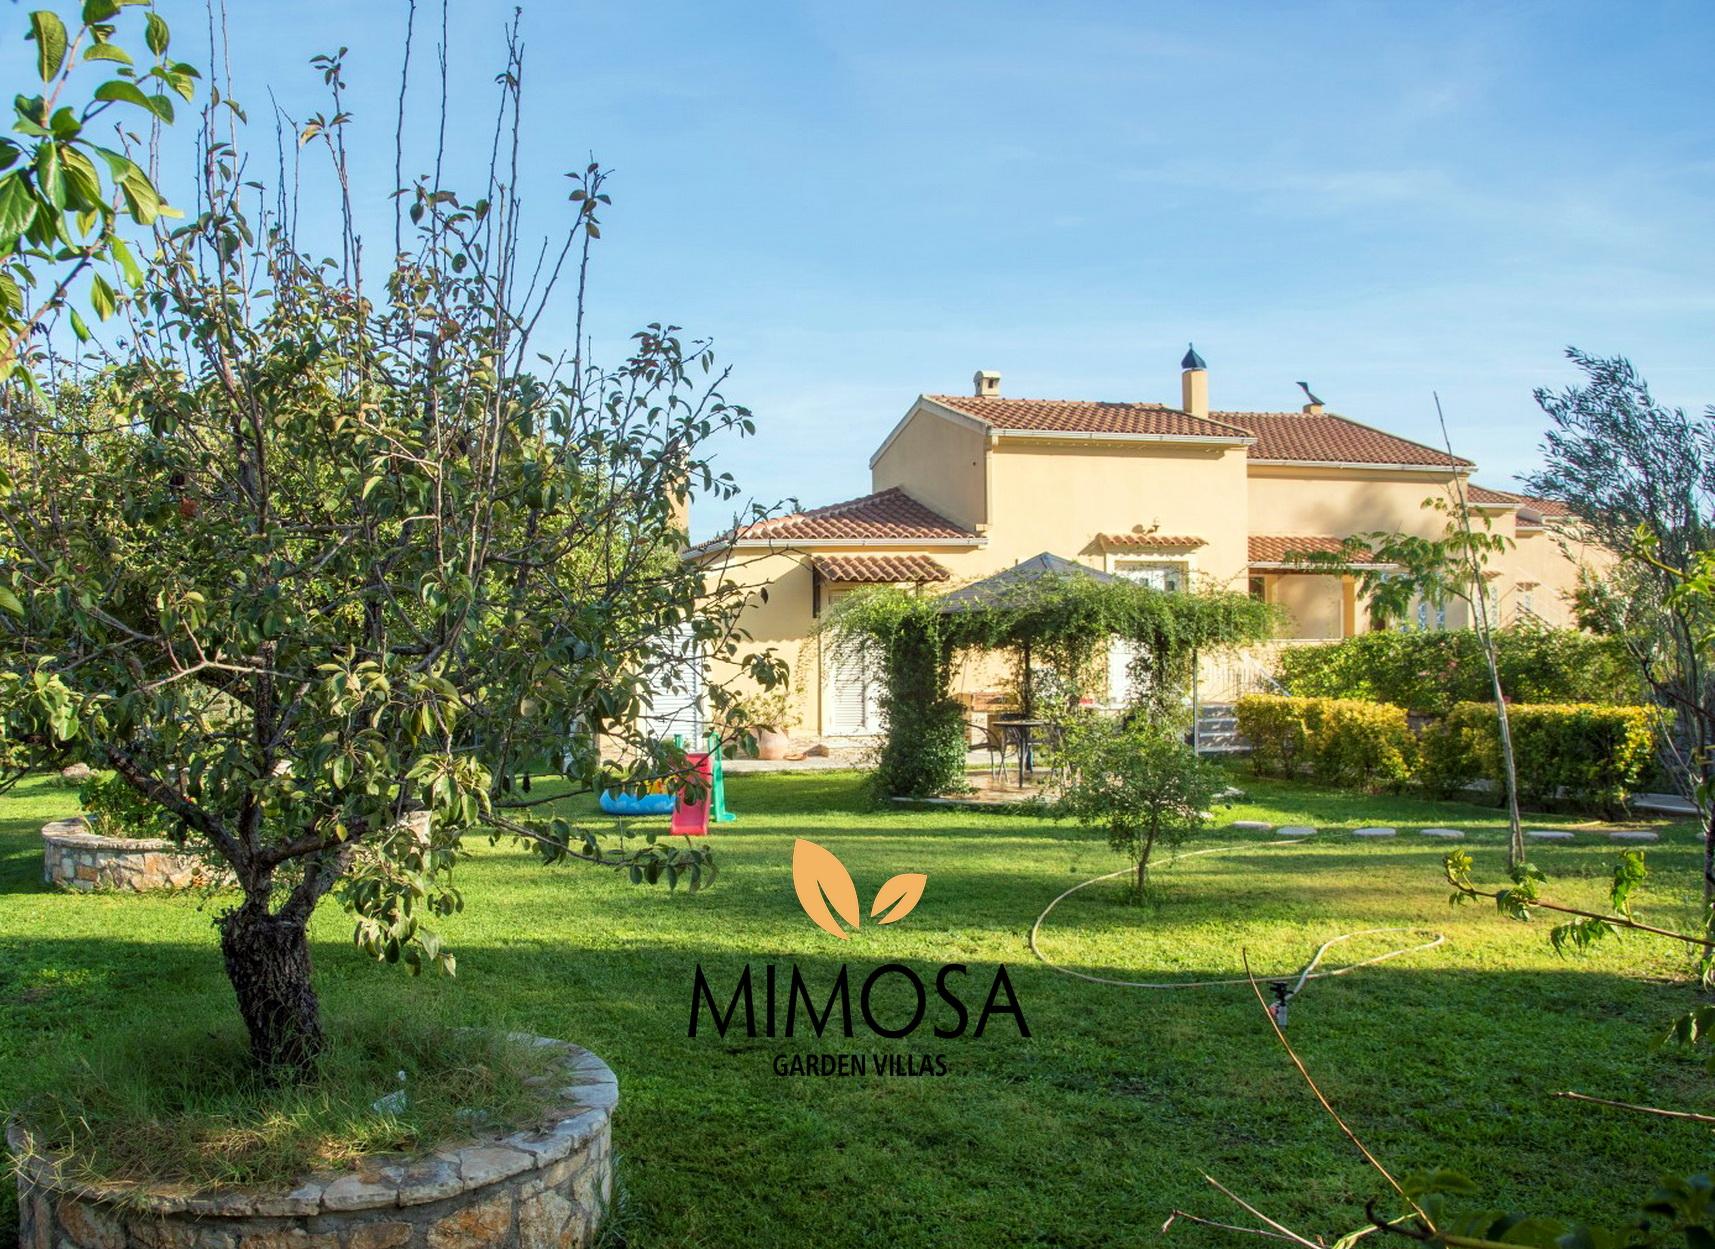 Mimosa garden villas